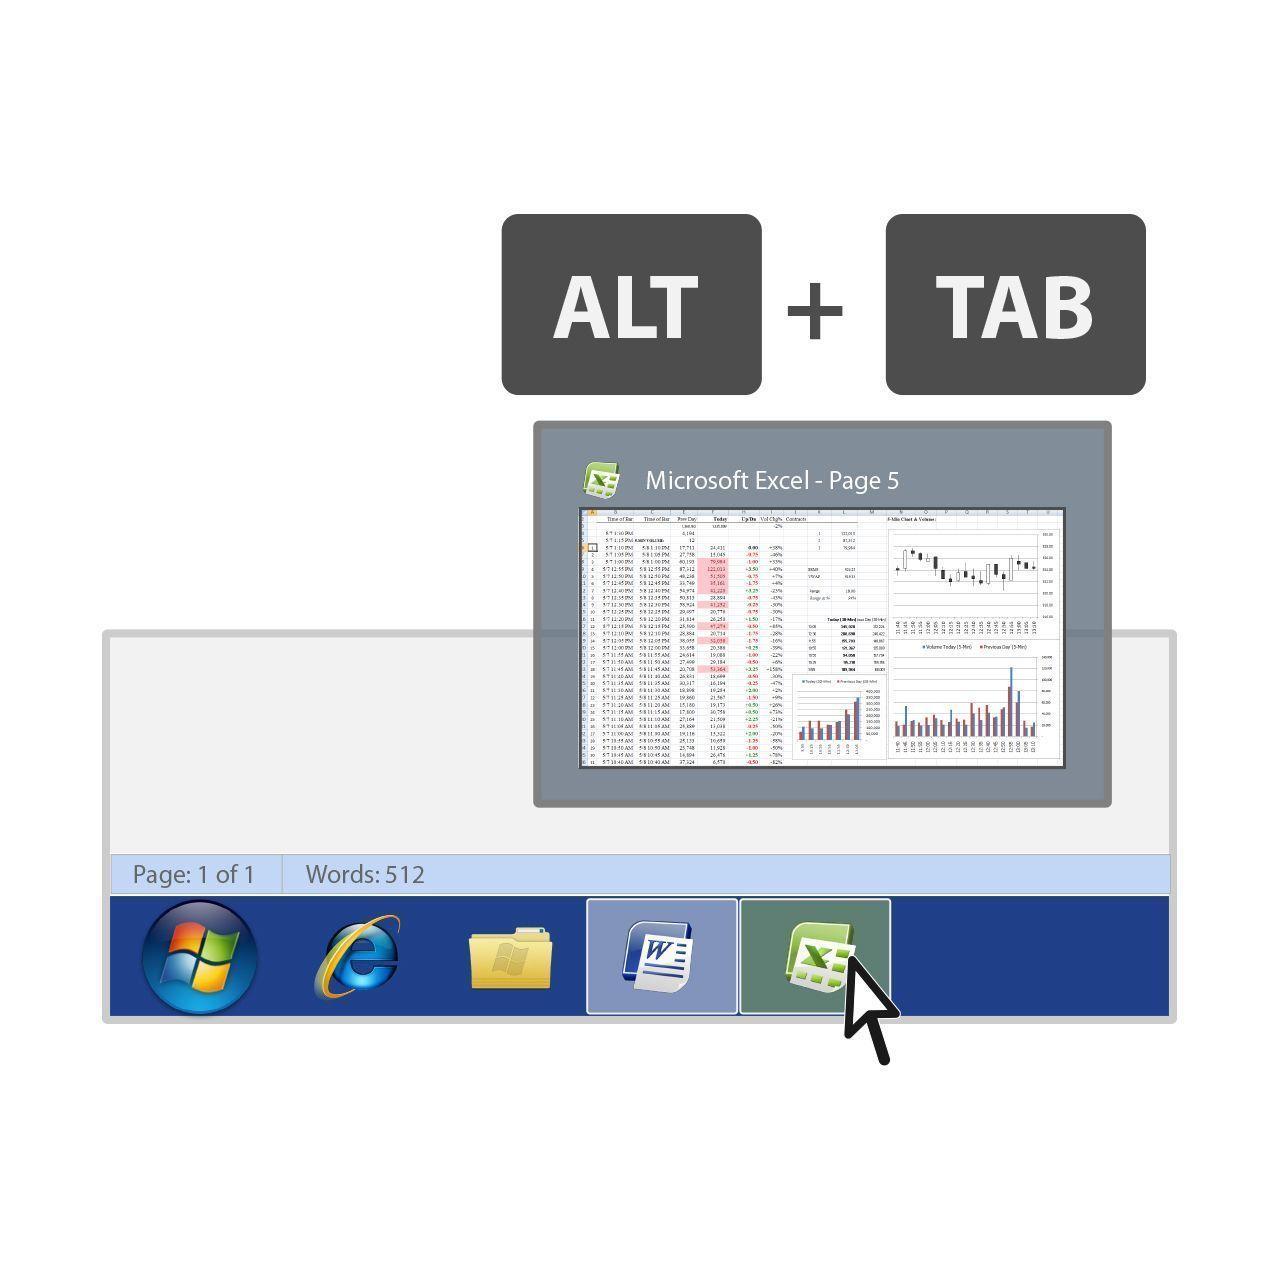 altmouse software arbosoftware ARTNRNNB alt+tab